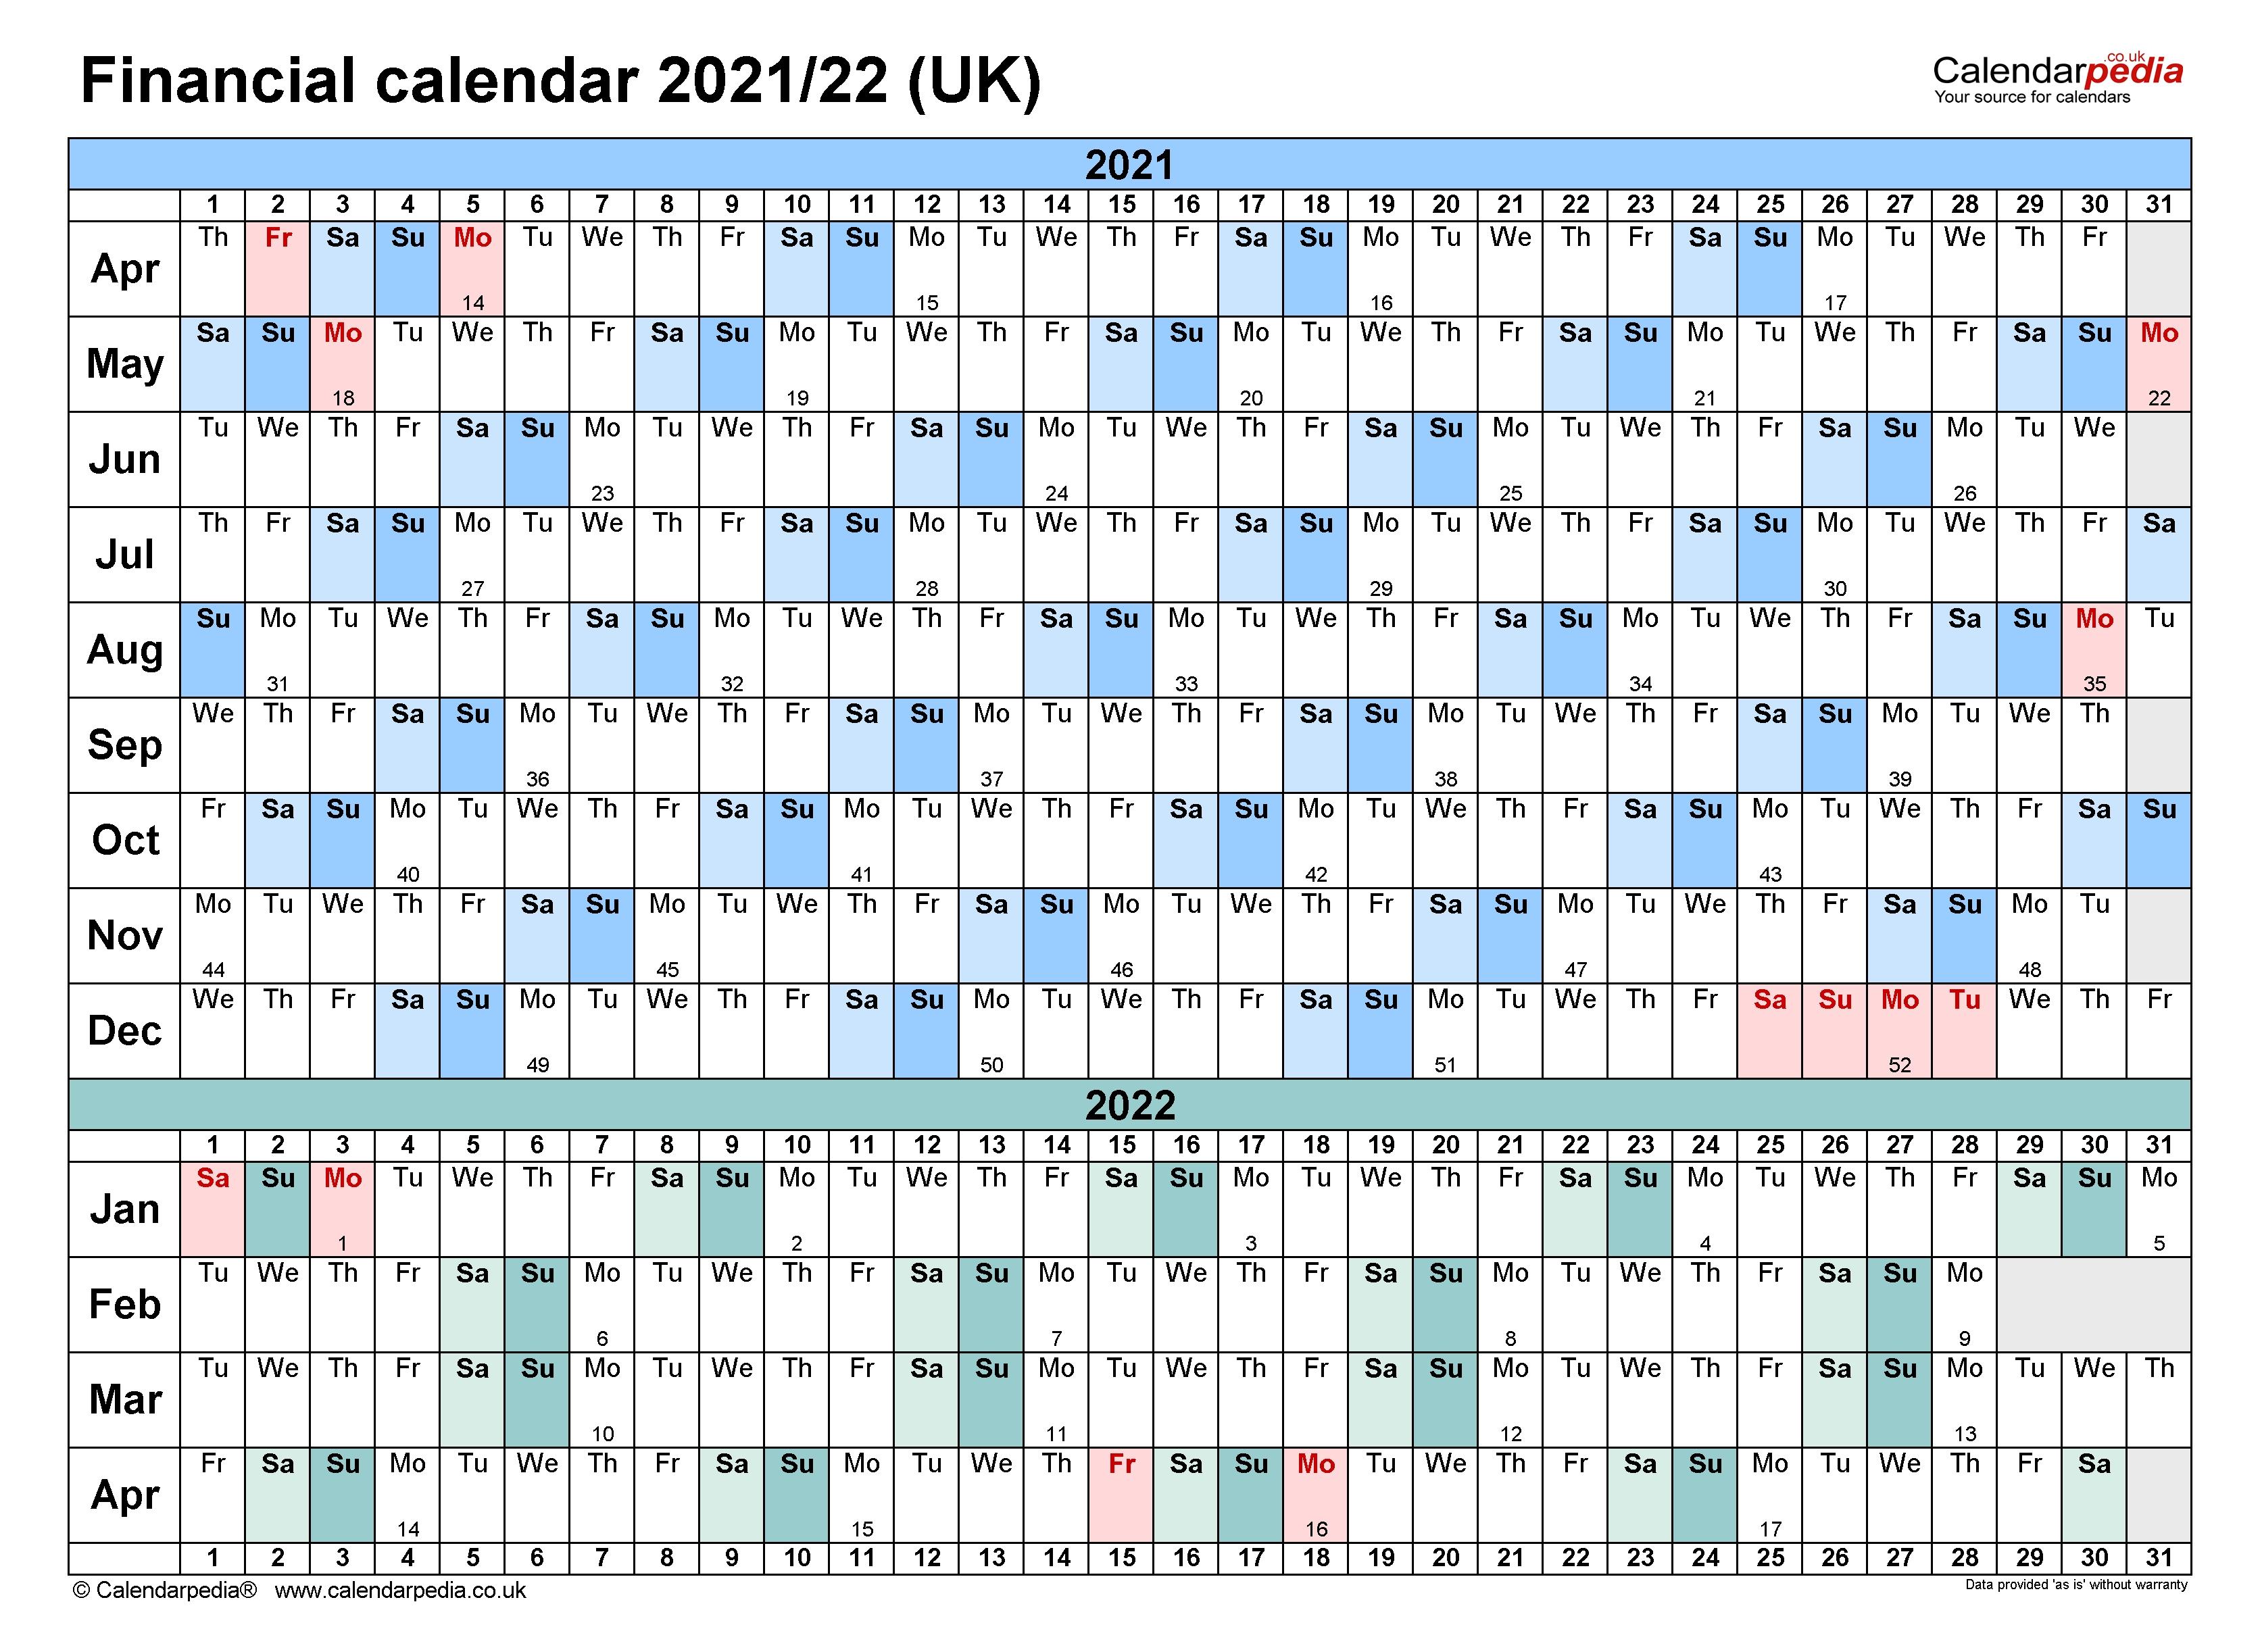 Financial Calendars 2021/22 (Uk) In Microsoft Word Format  Financial Year Calendar 2021/19 Australia